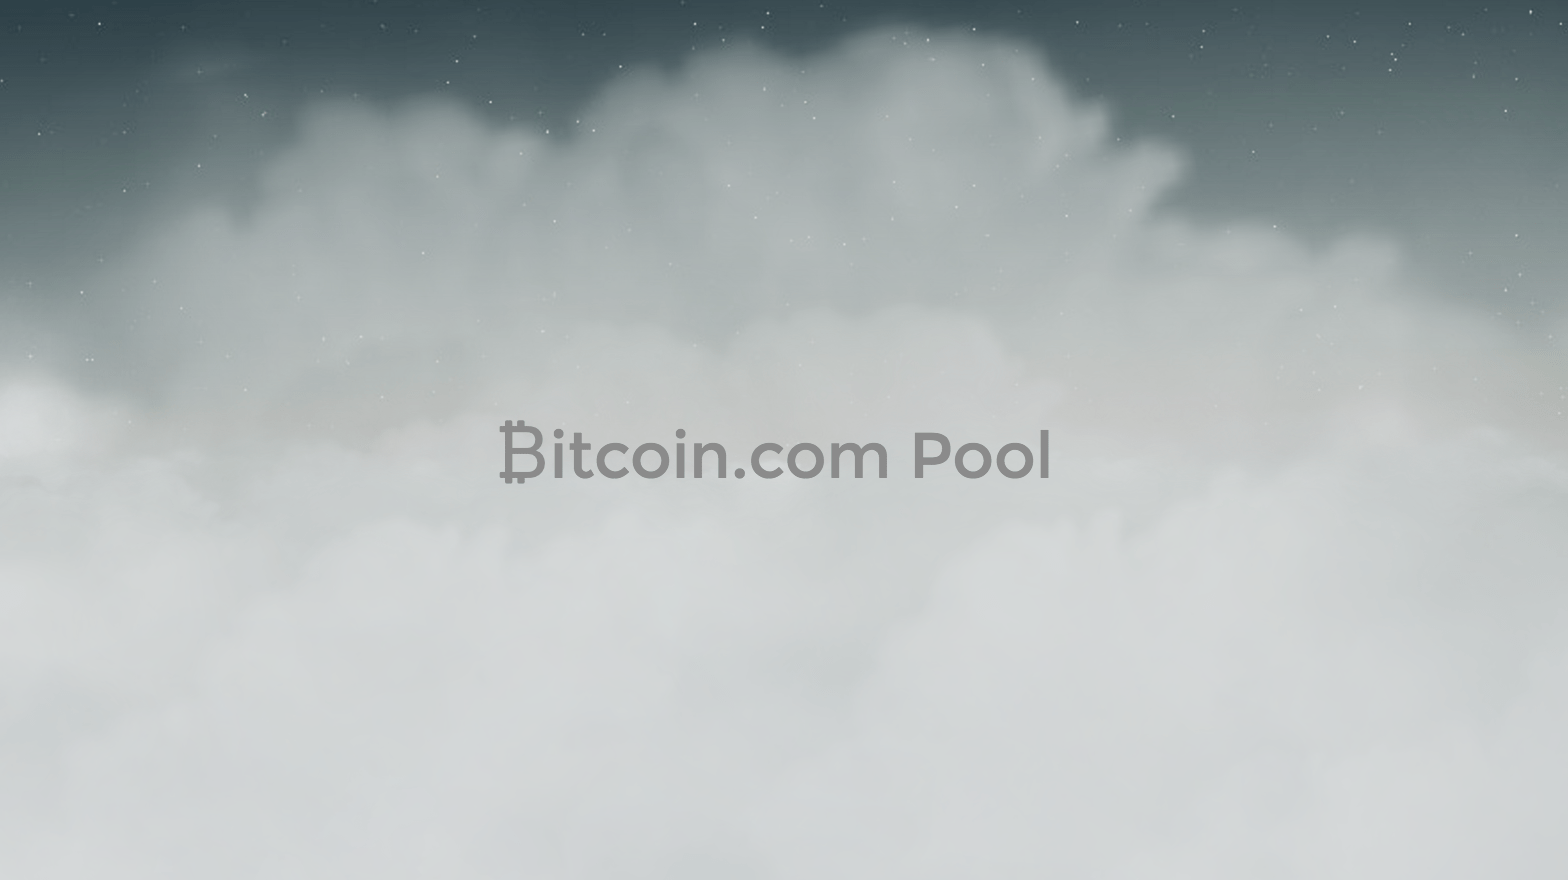 bitcoin.com, mining pool, bitcoin unlimited, bitcoin classic, bitcoin core, bip109